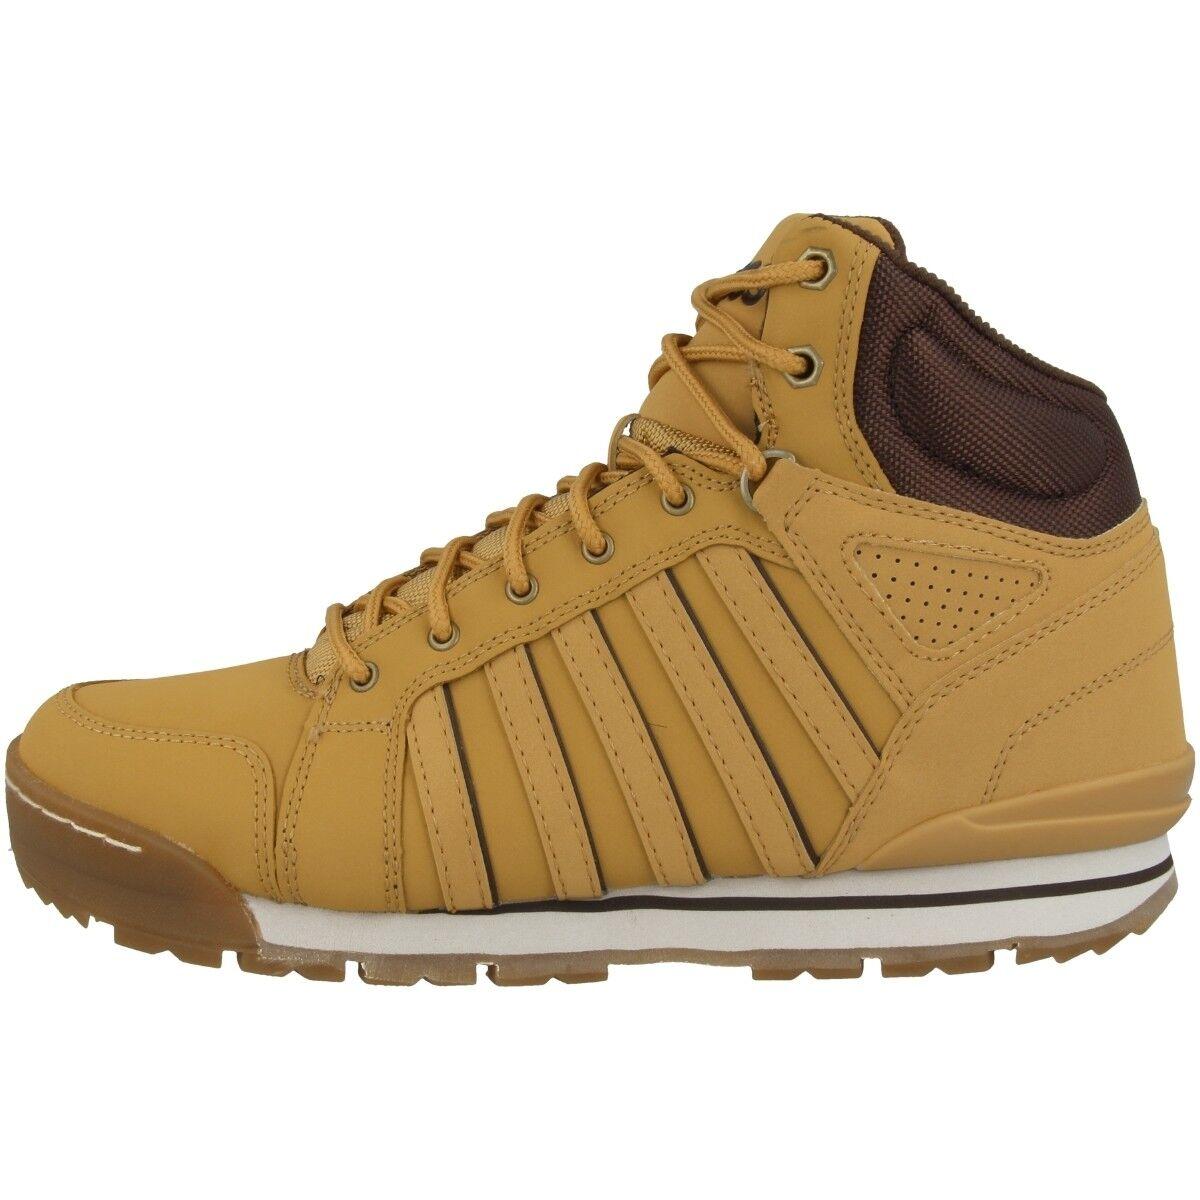 K-Swiss Norfolk High Sc Scarpe Stivali Uomo High Norfolk Top Sneaker Ambra Oro 05677-721 3425db